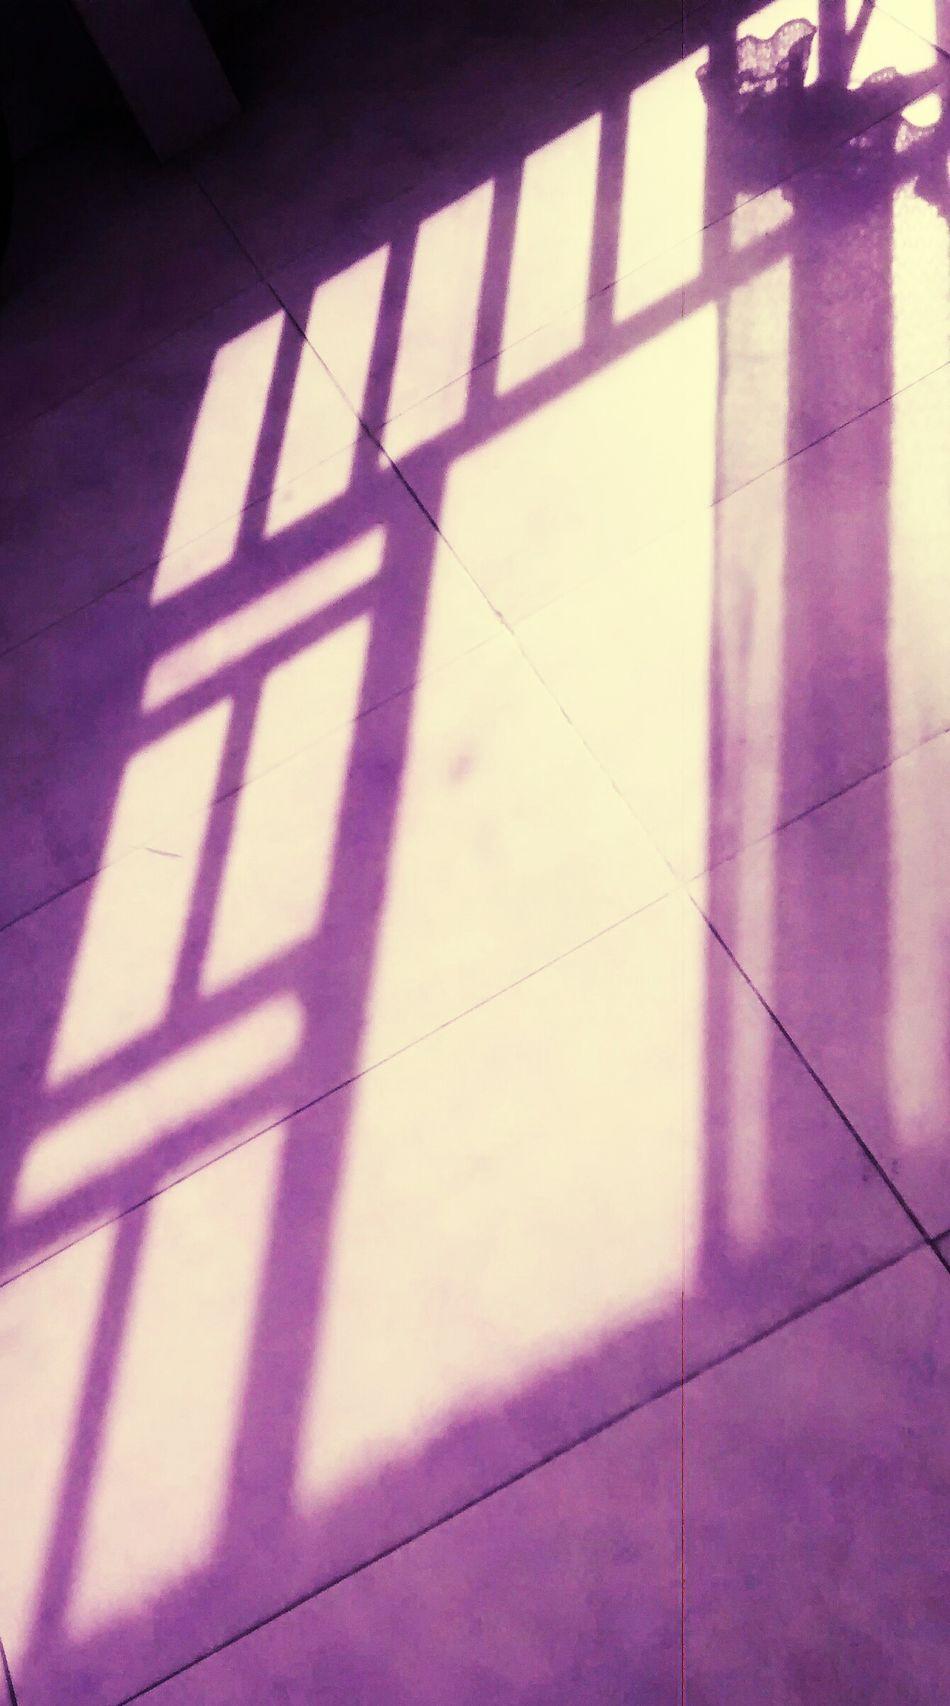 Global Photographer Works Exhibition Violeta Garden Photography Conceptual Photography  Artistic Photography Composition Abstraction Arte En Foco Texturas Y Colores Eye4photography  Colombia Musical Academia Mobilephotography Creativity Abstract